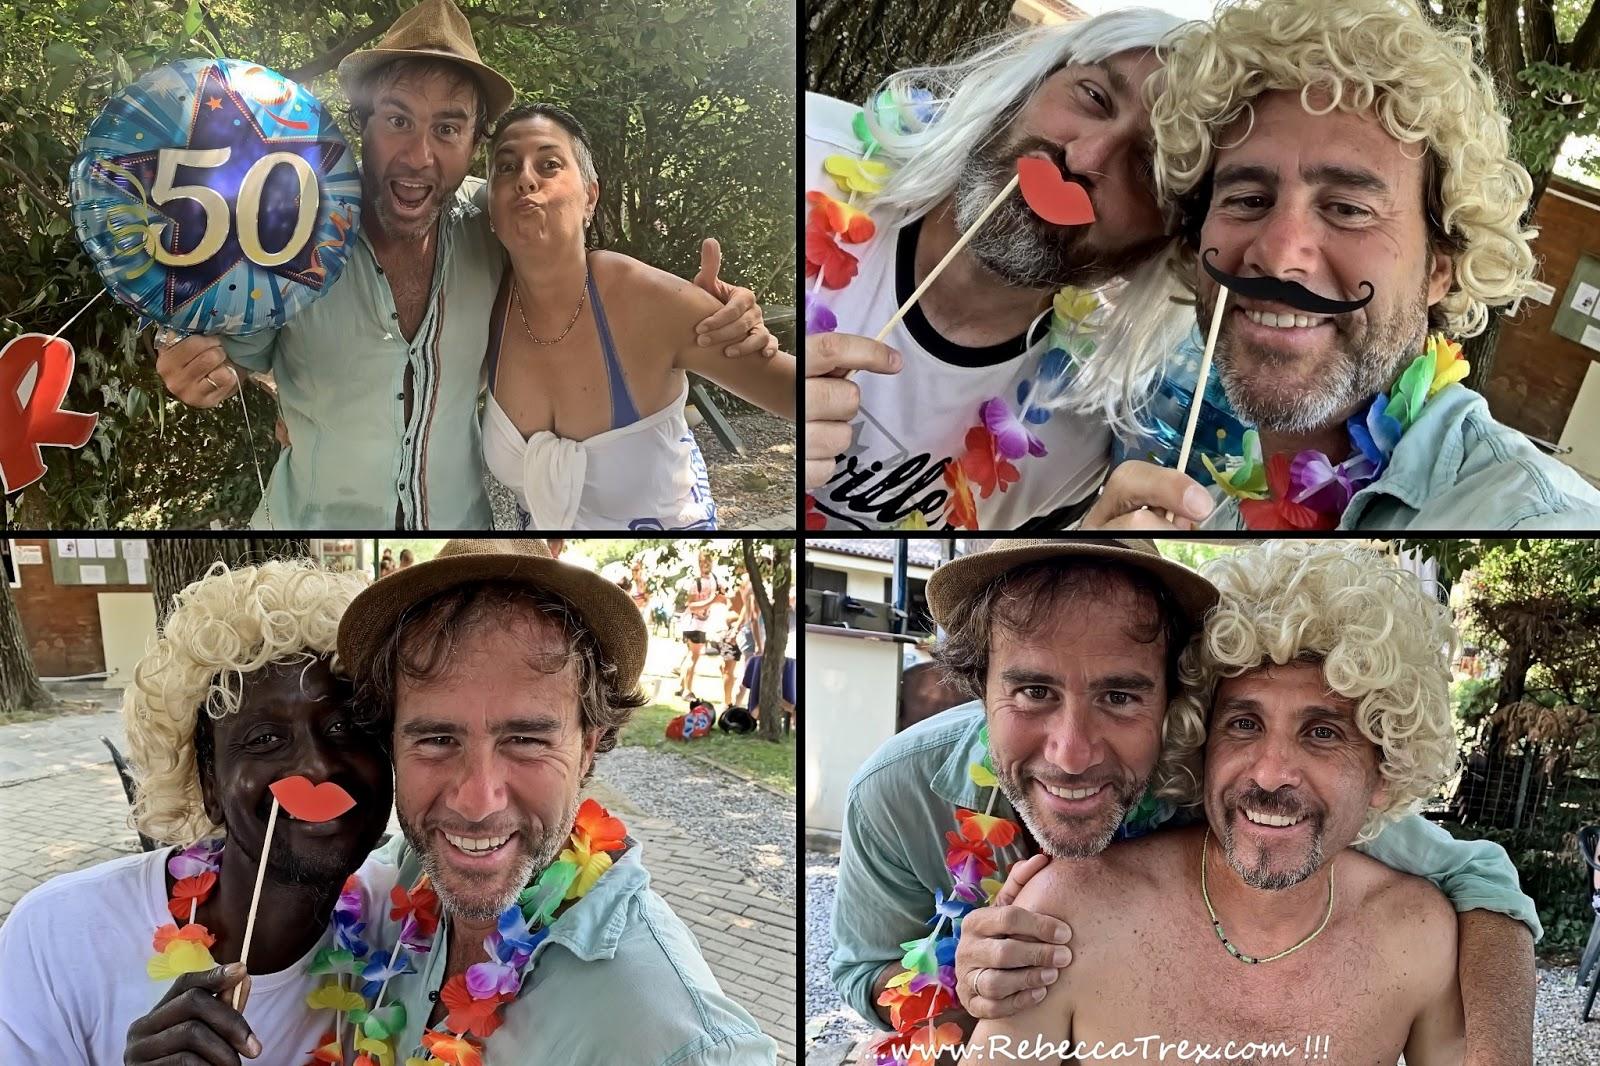 Festa A Sorpresa Di Compleanno www.rebeccatrex !!!: festa di compleanno di papà in